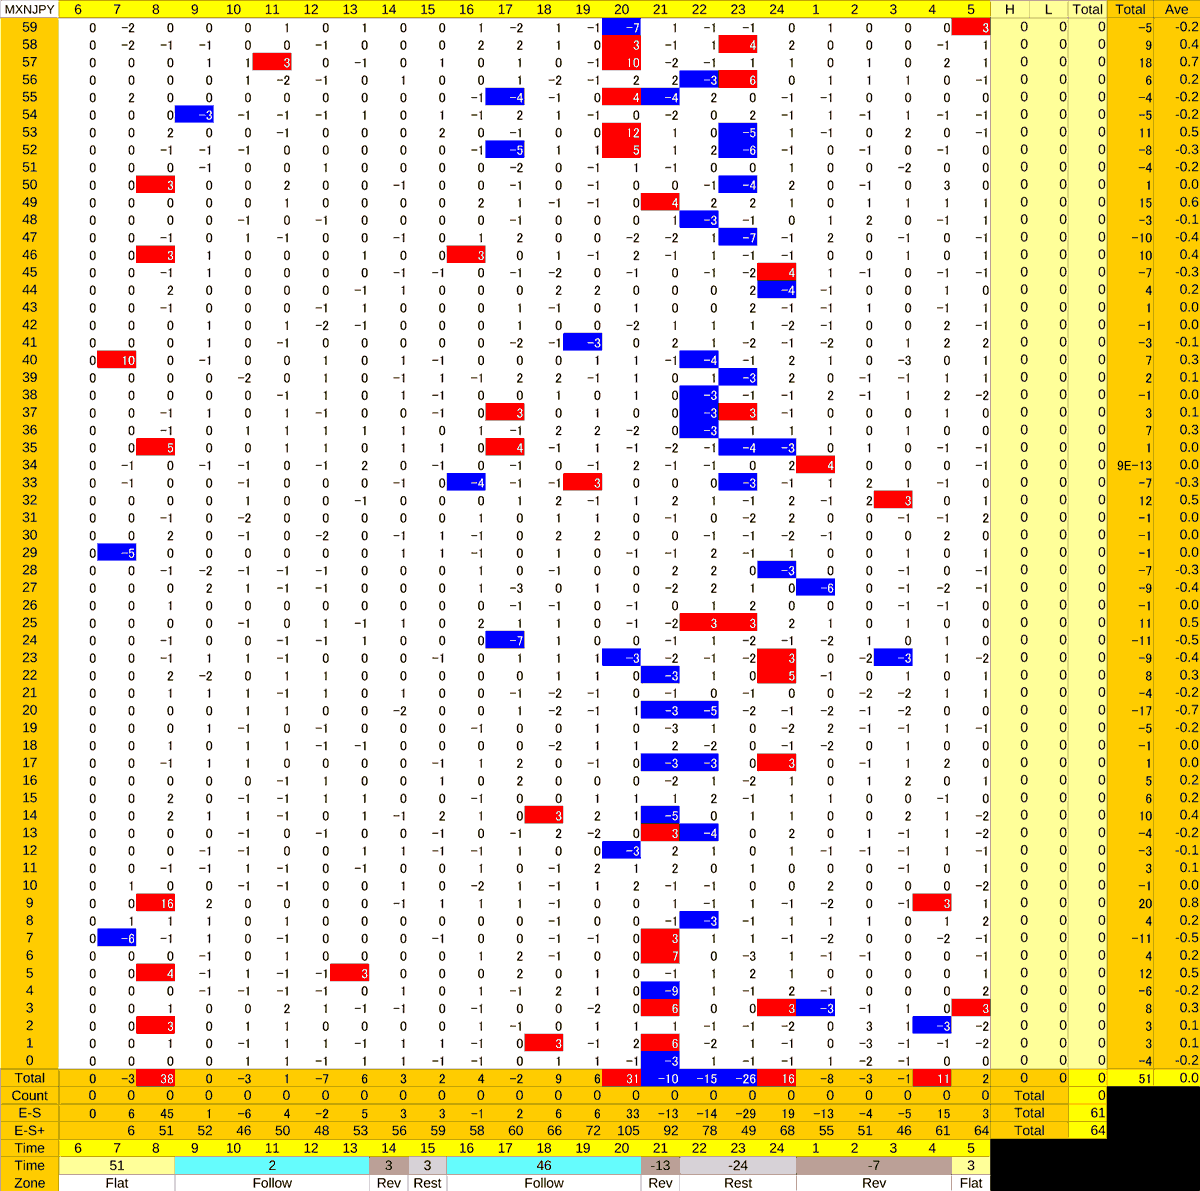 20201116_HS(3)MXNJPY